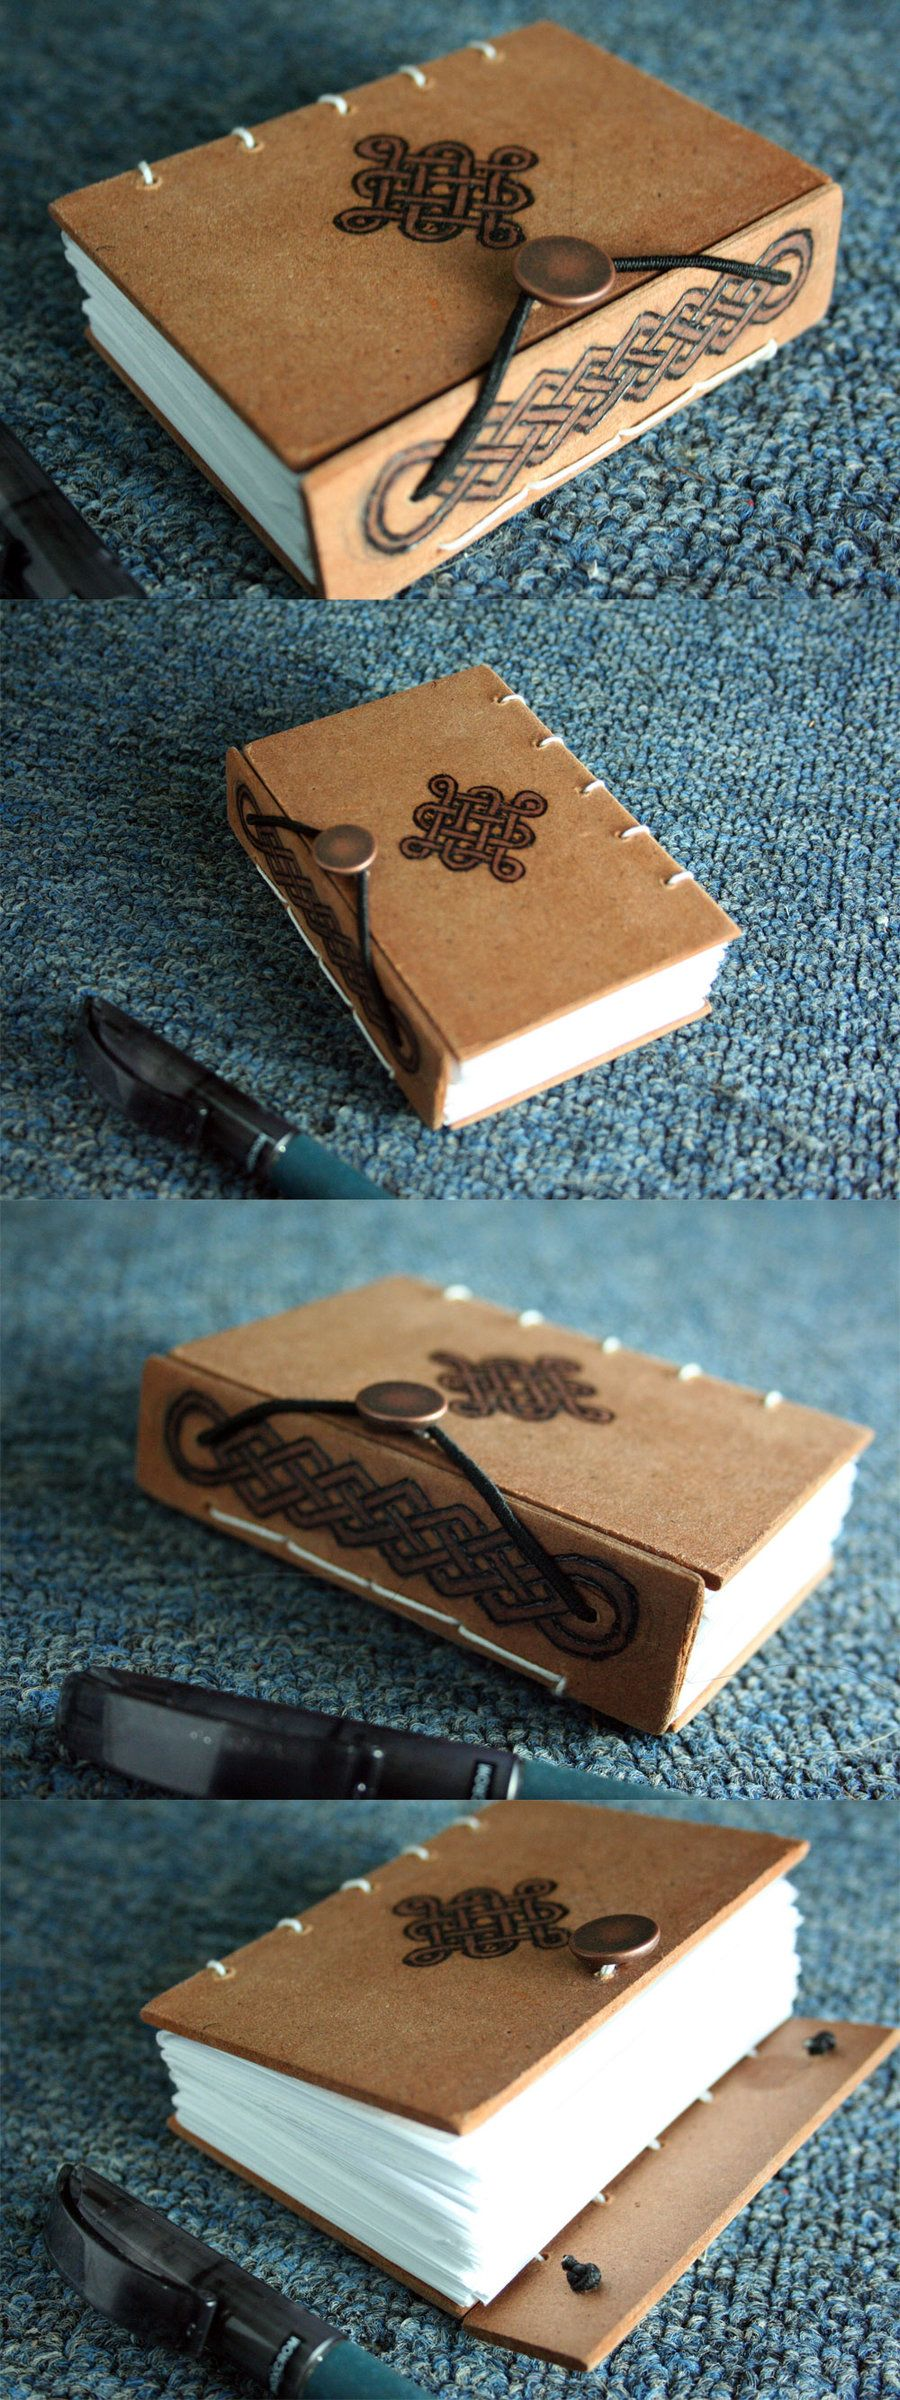 Wooden Celtic Book by yagarasu.deviantart.com on @deviantART